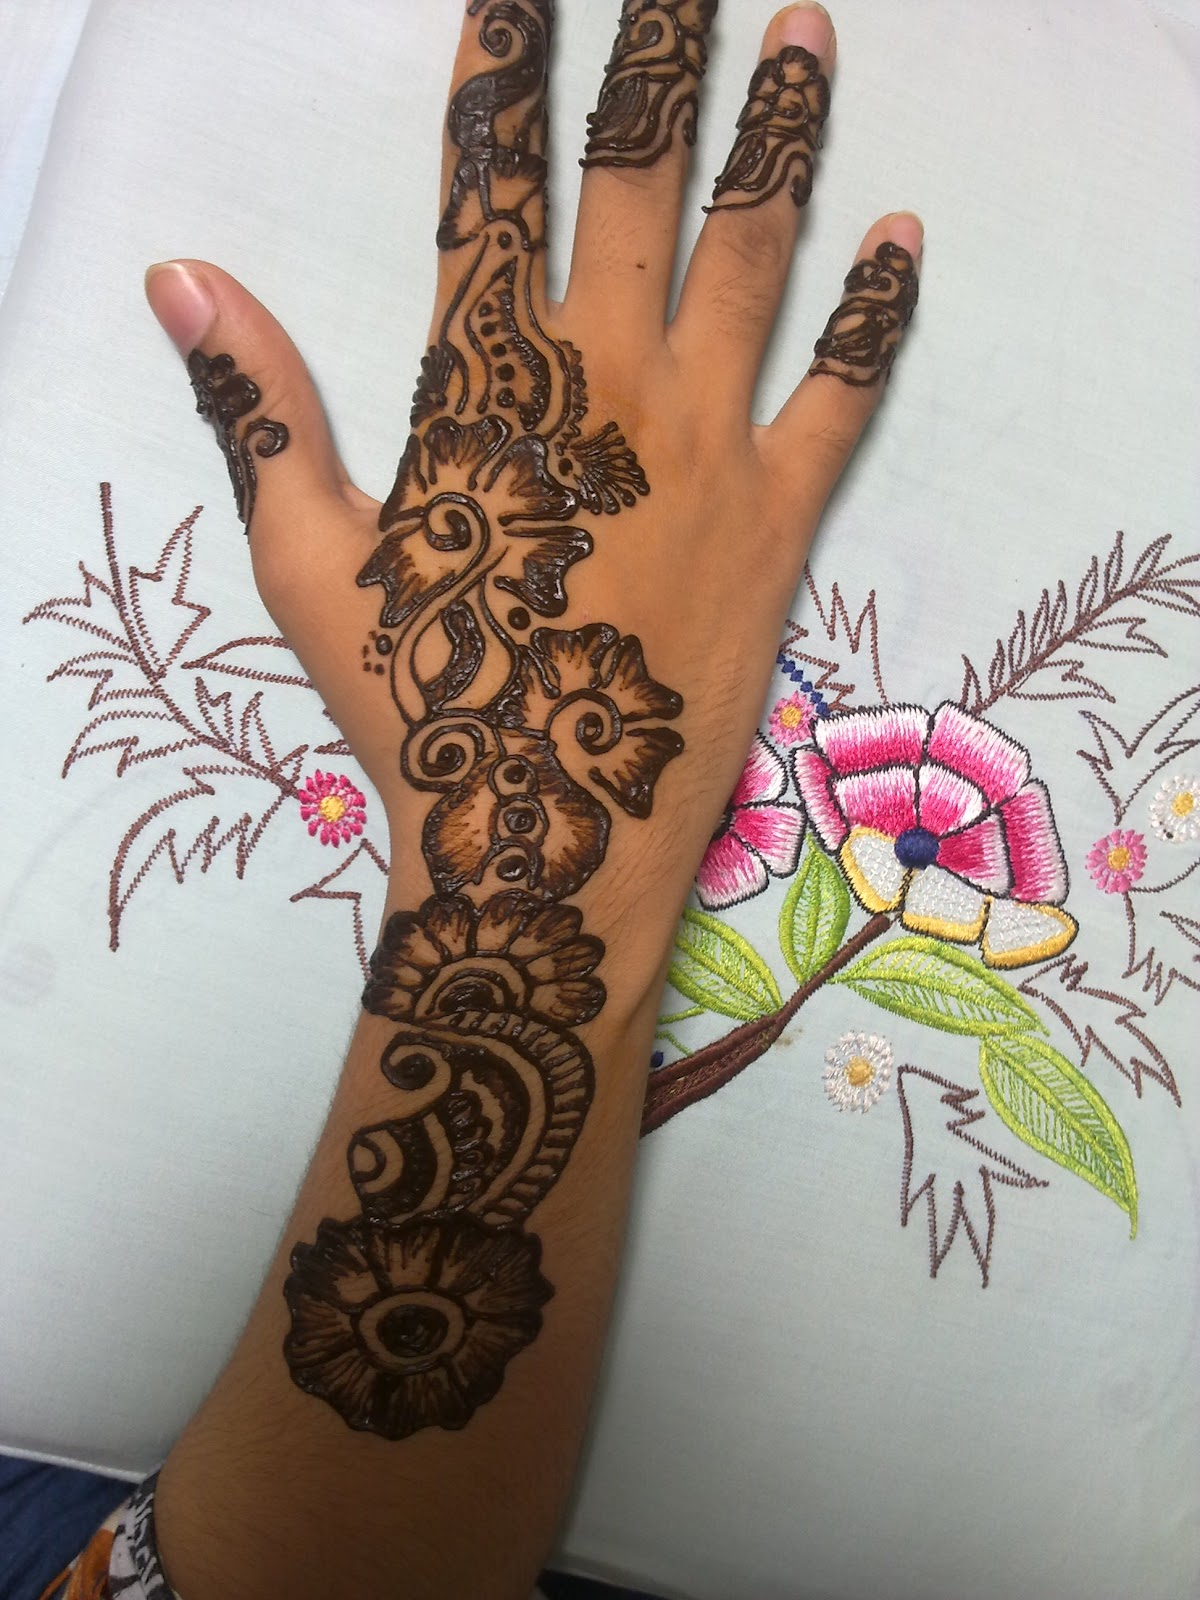 Mehndi Design: Mehndi Designs For Hands : New Arabic Mehndi Designs 2012